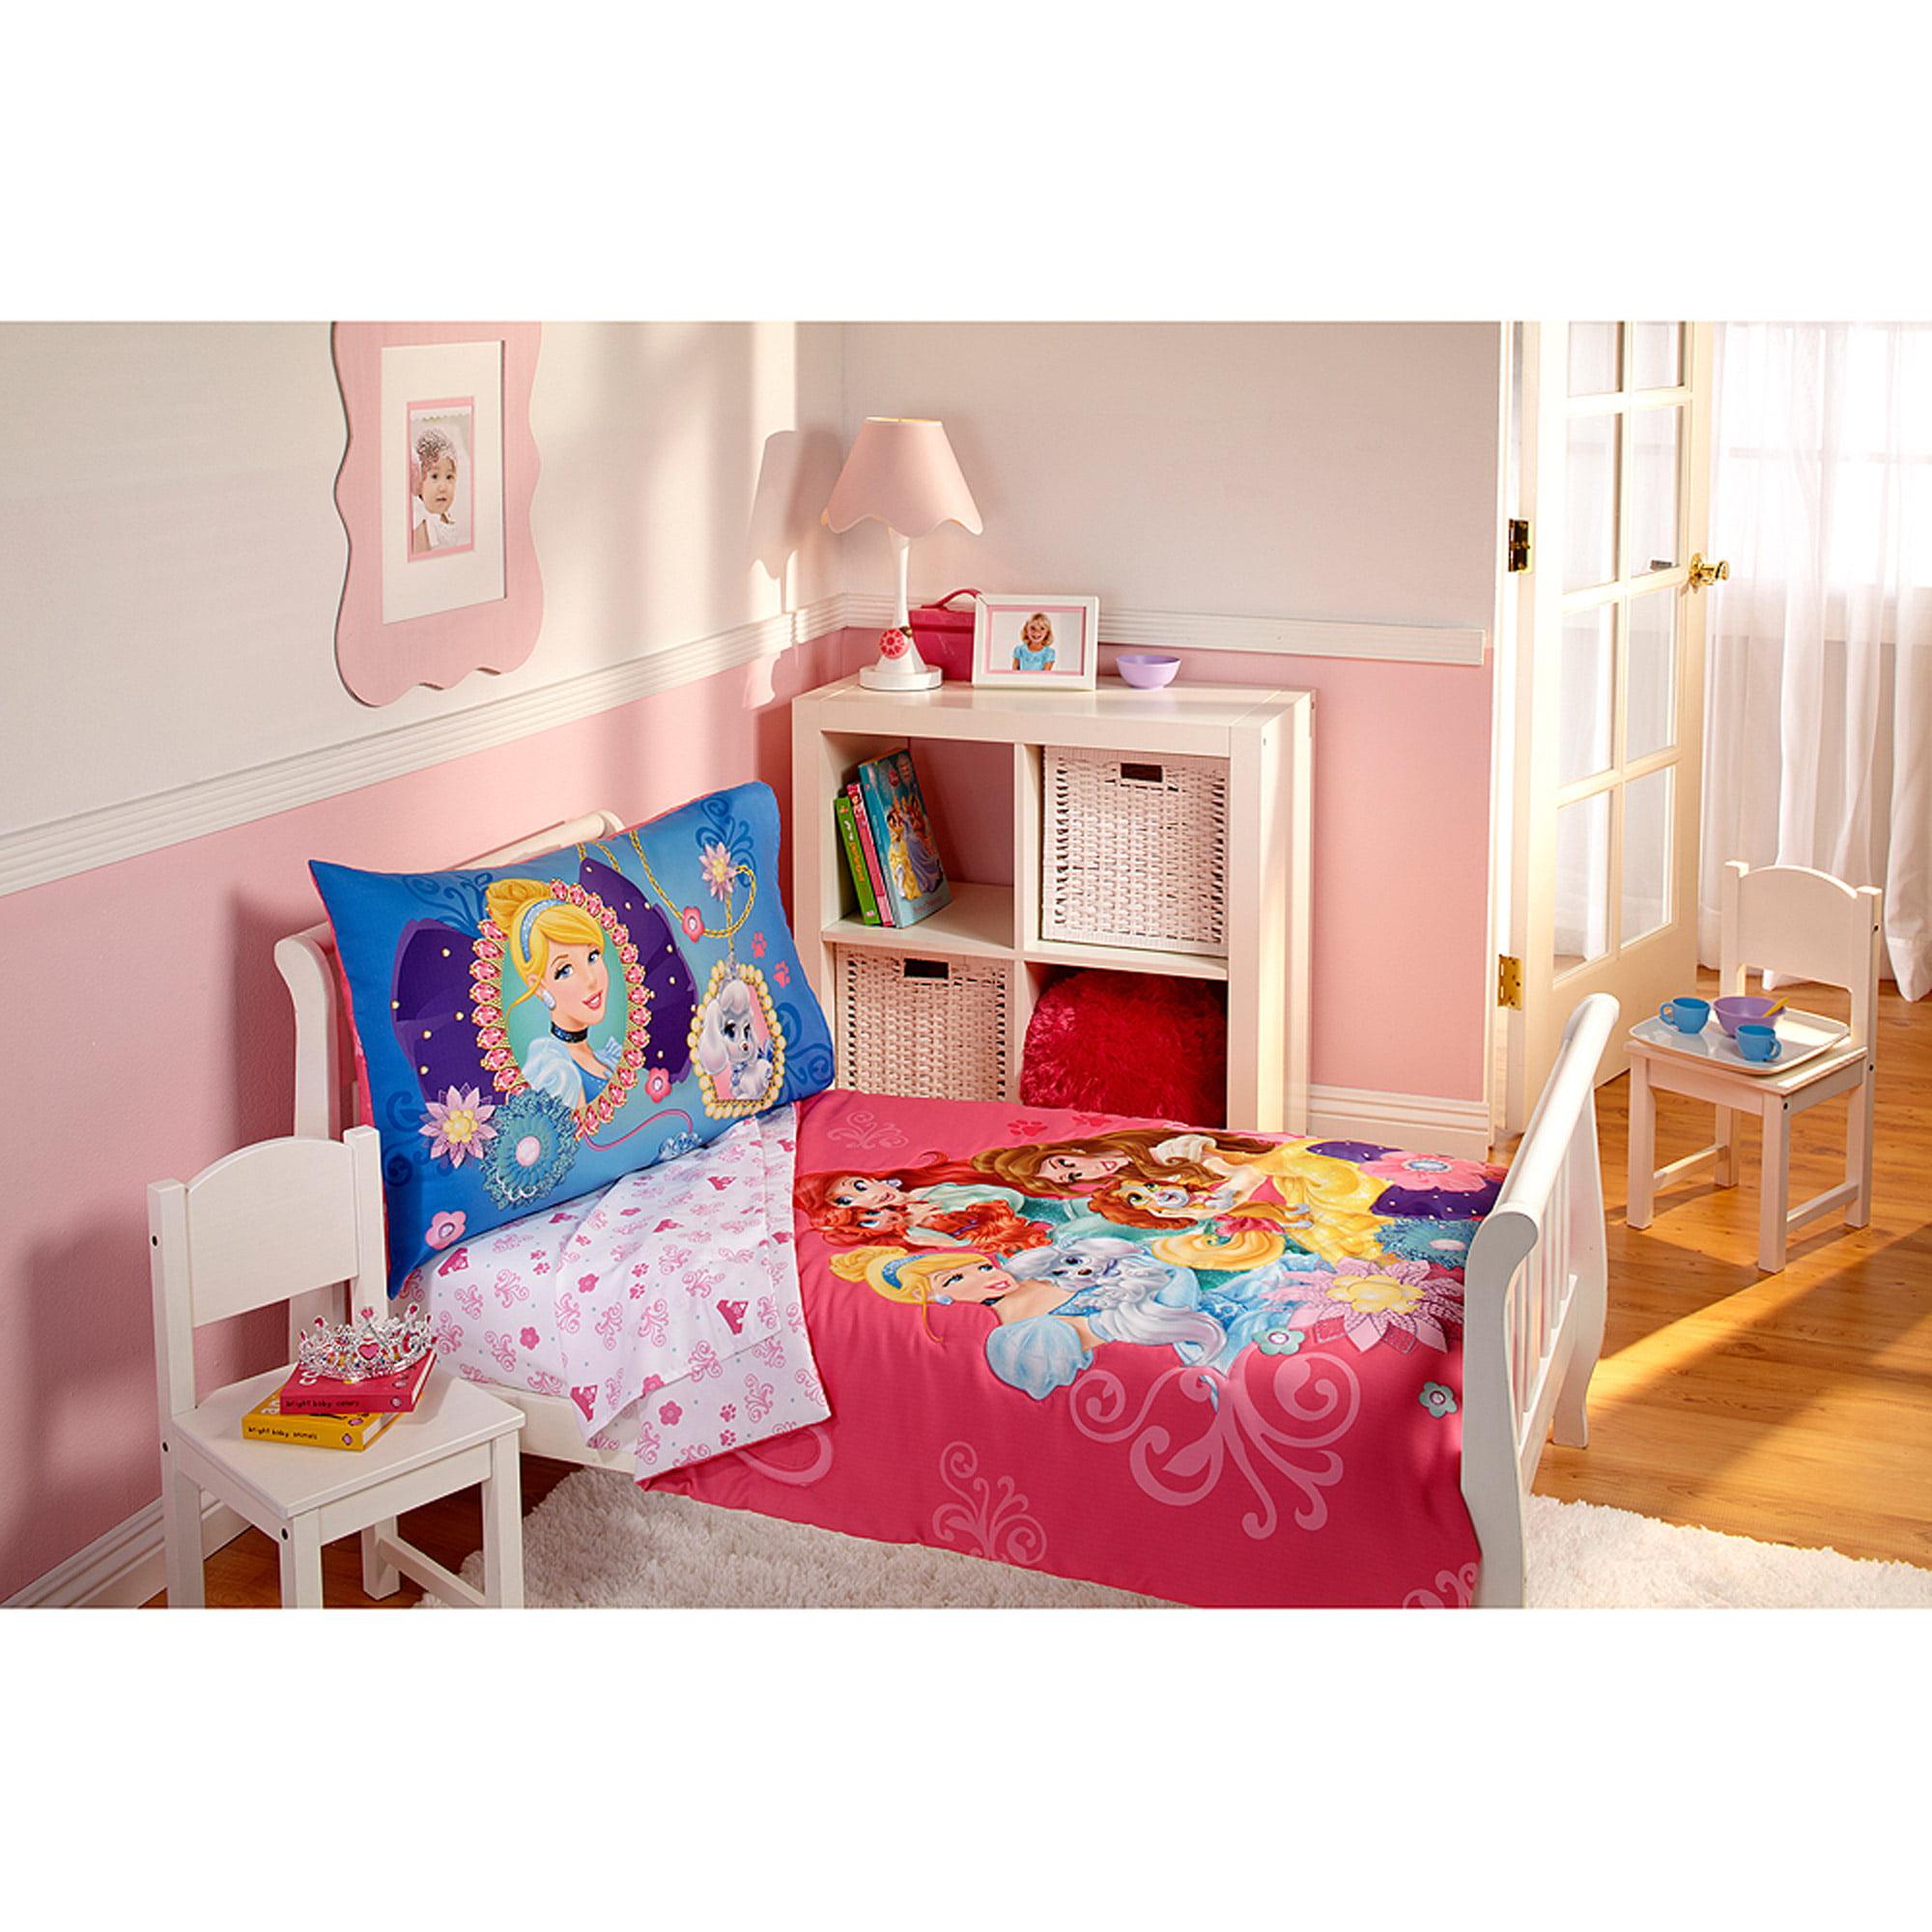 Disney Palace Pets 3pc Toddler Bedding Set with BONUS Matching Pillow Case